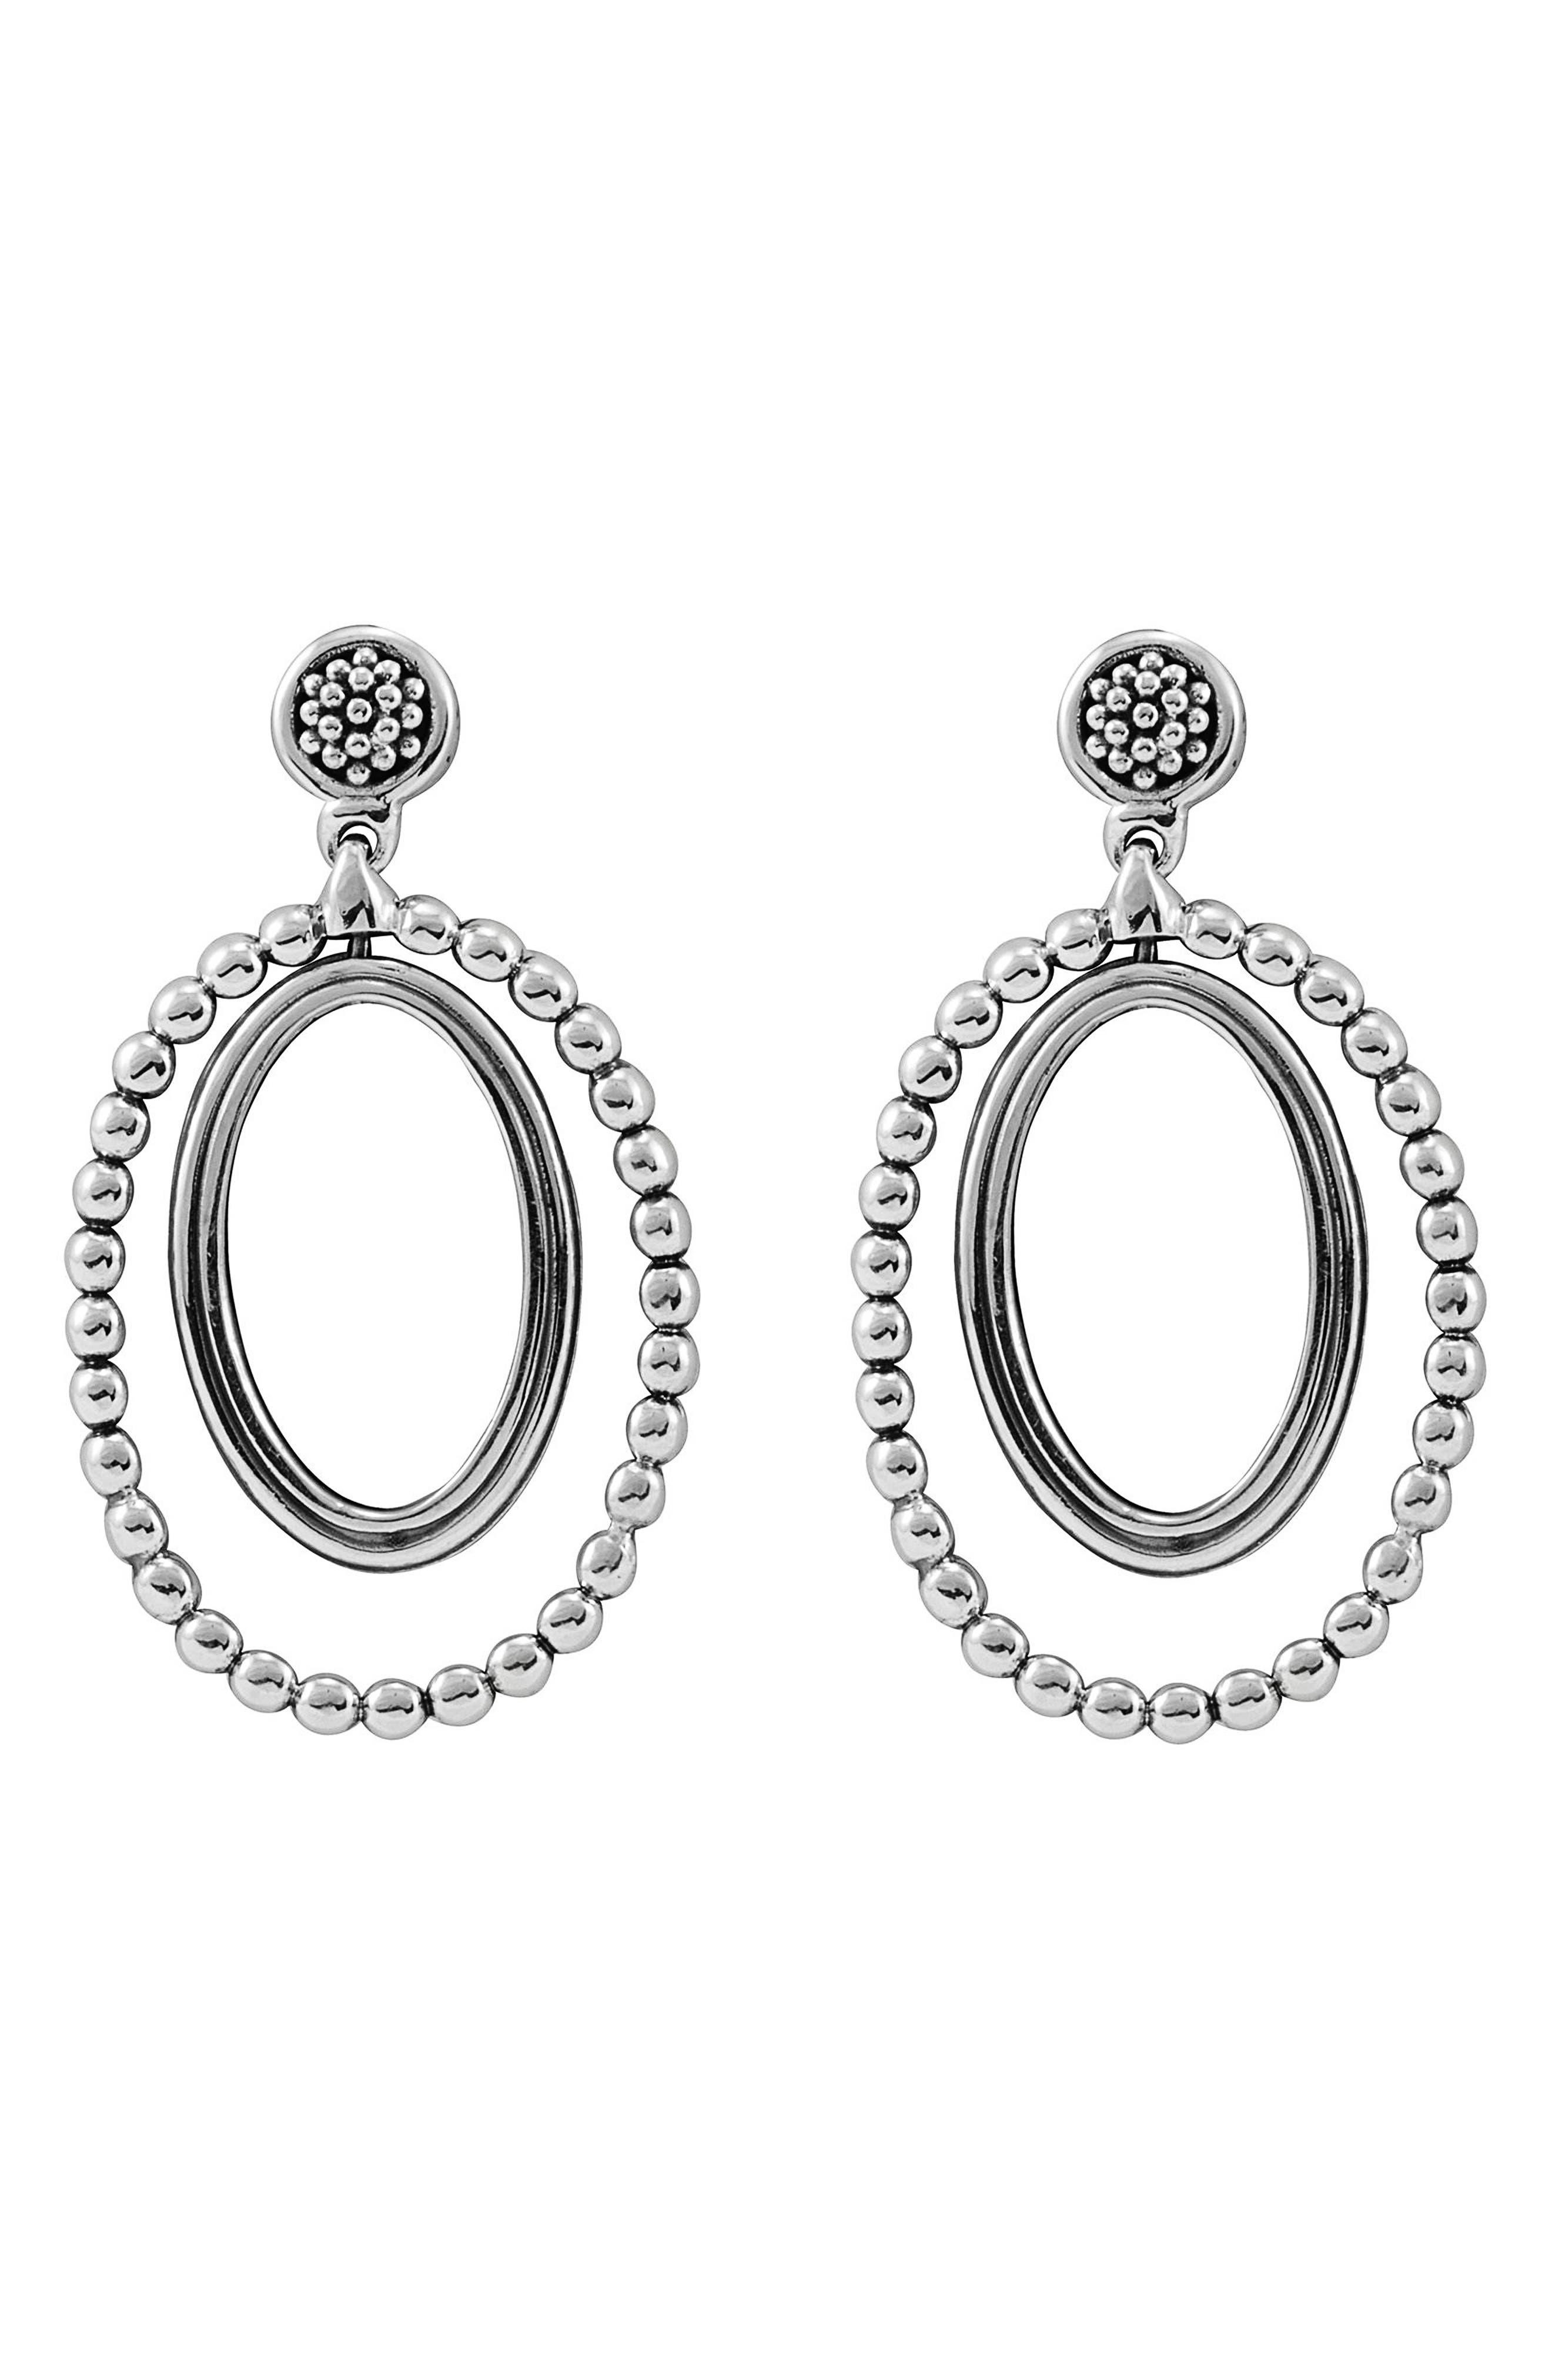 Main Image - LAGOS Caviar Oval Twist Earrings